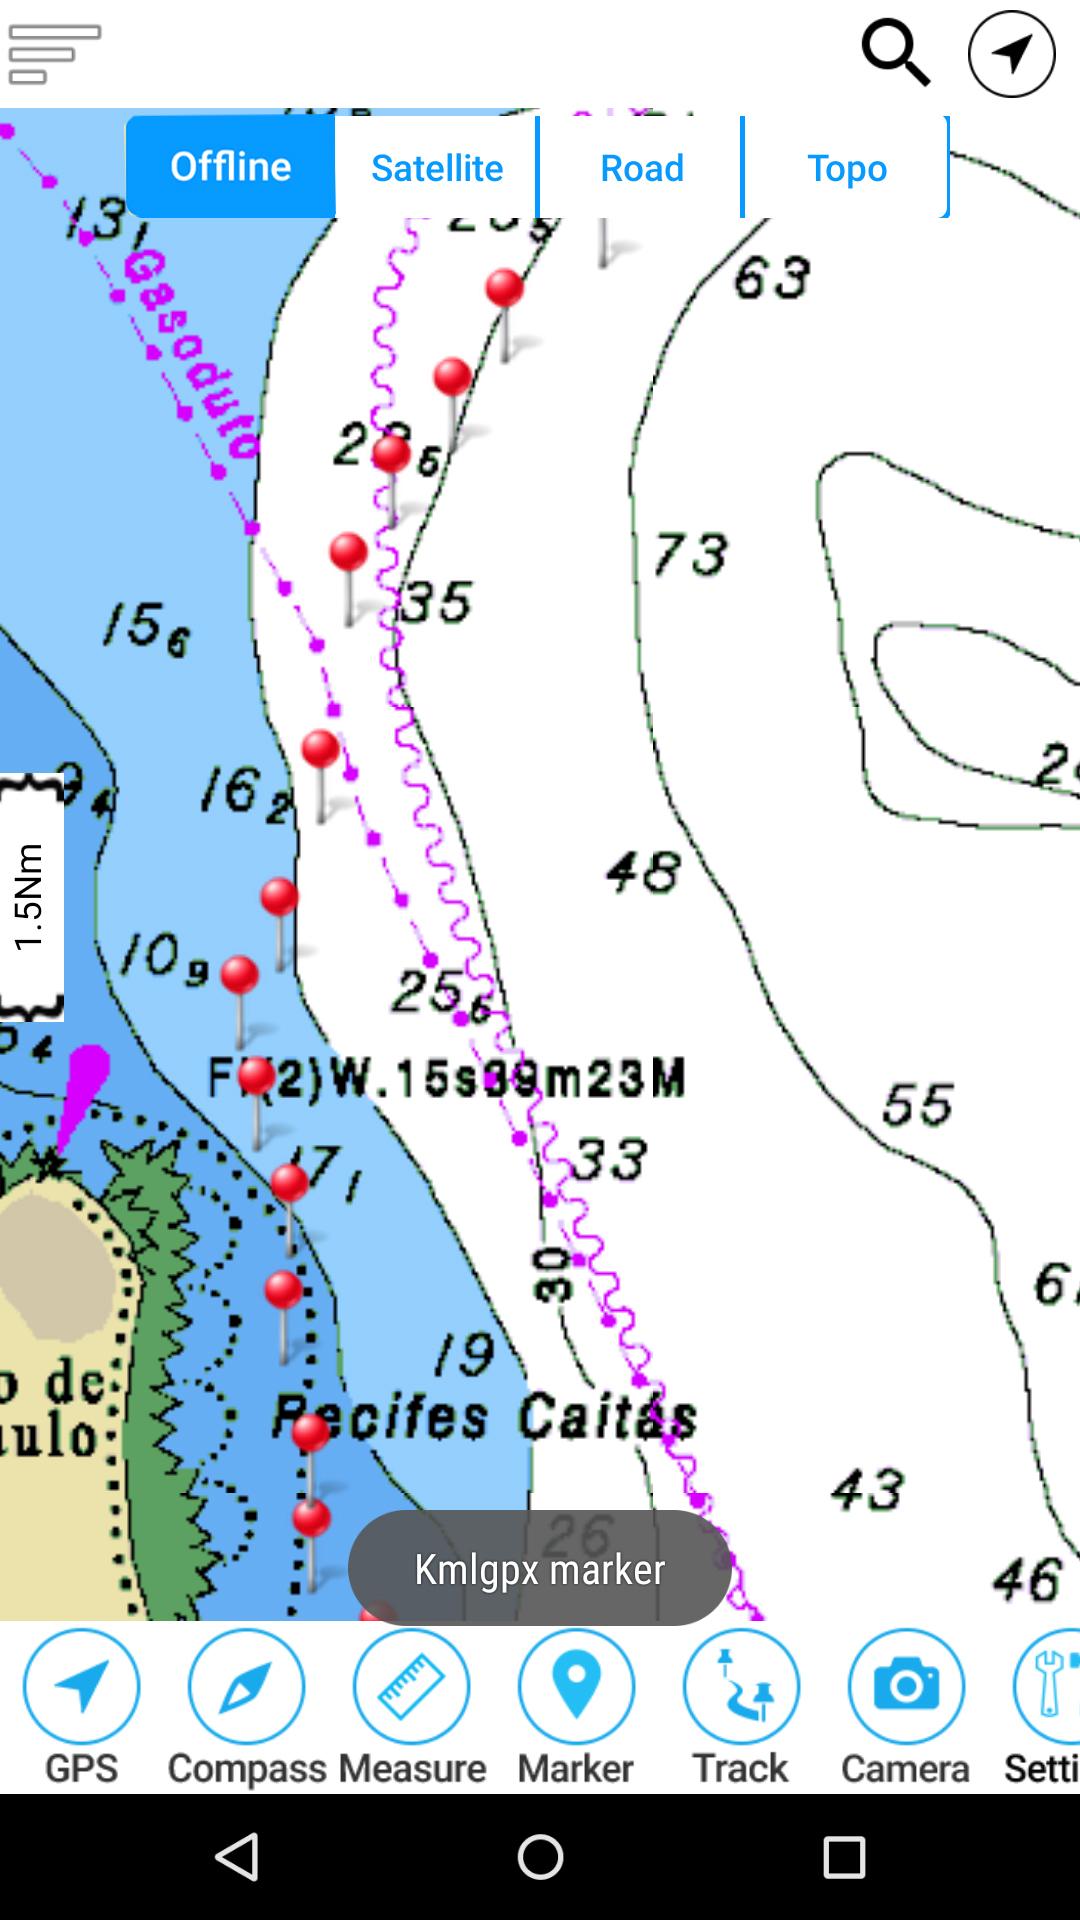 Lake Taupo New Zealand Offline GPS Nautical Chart